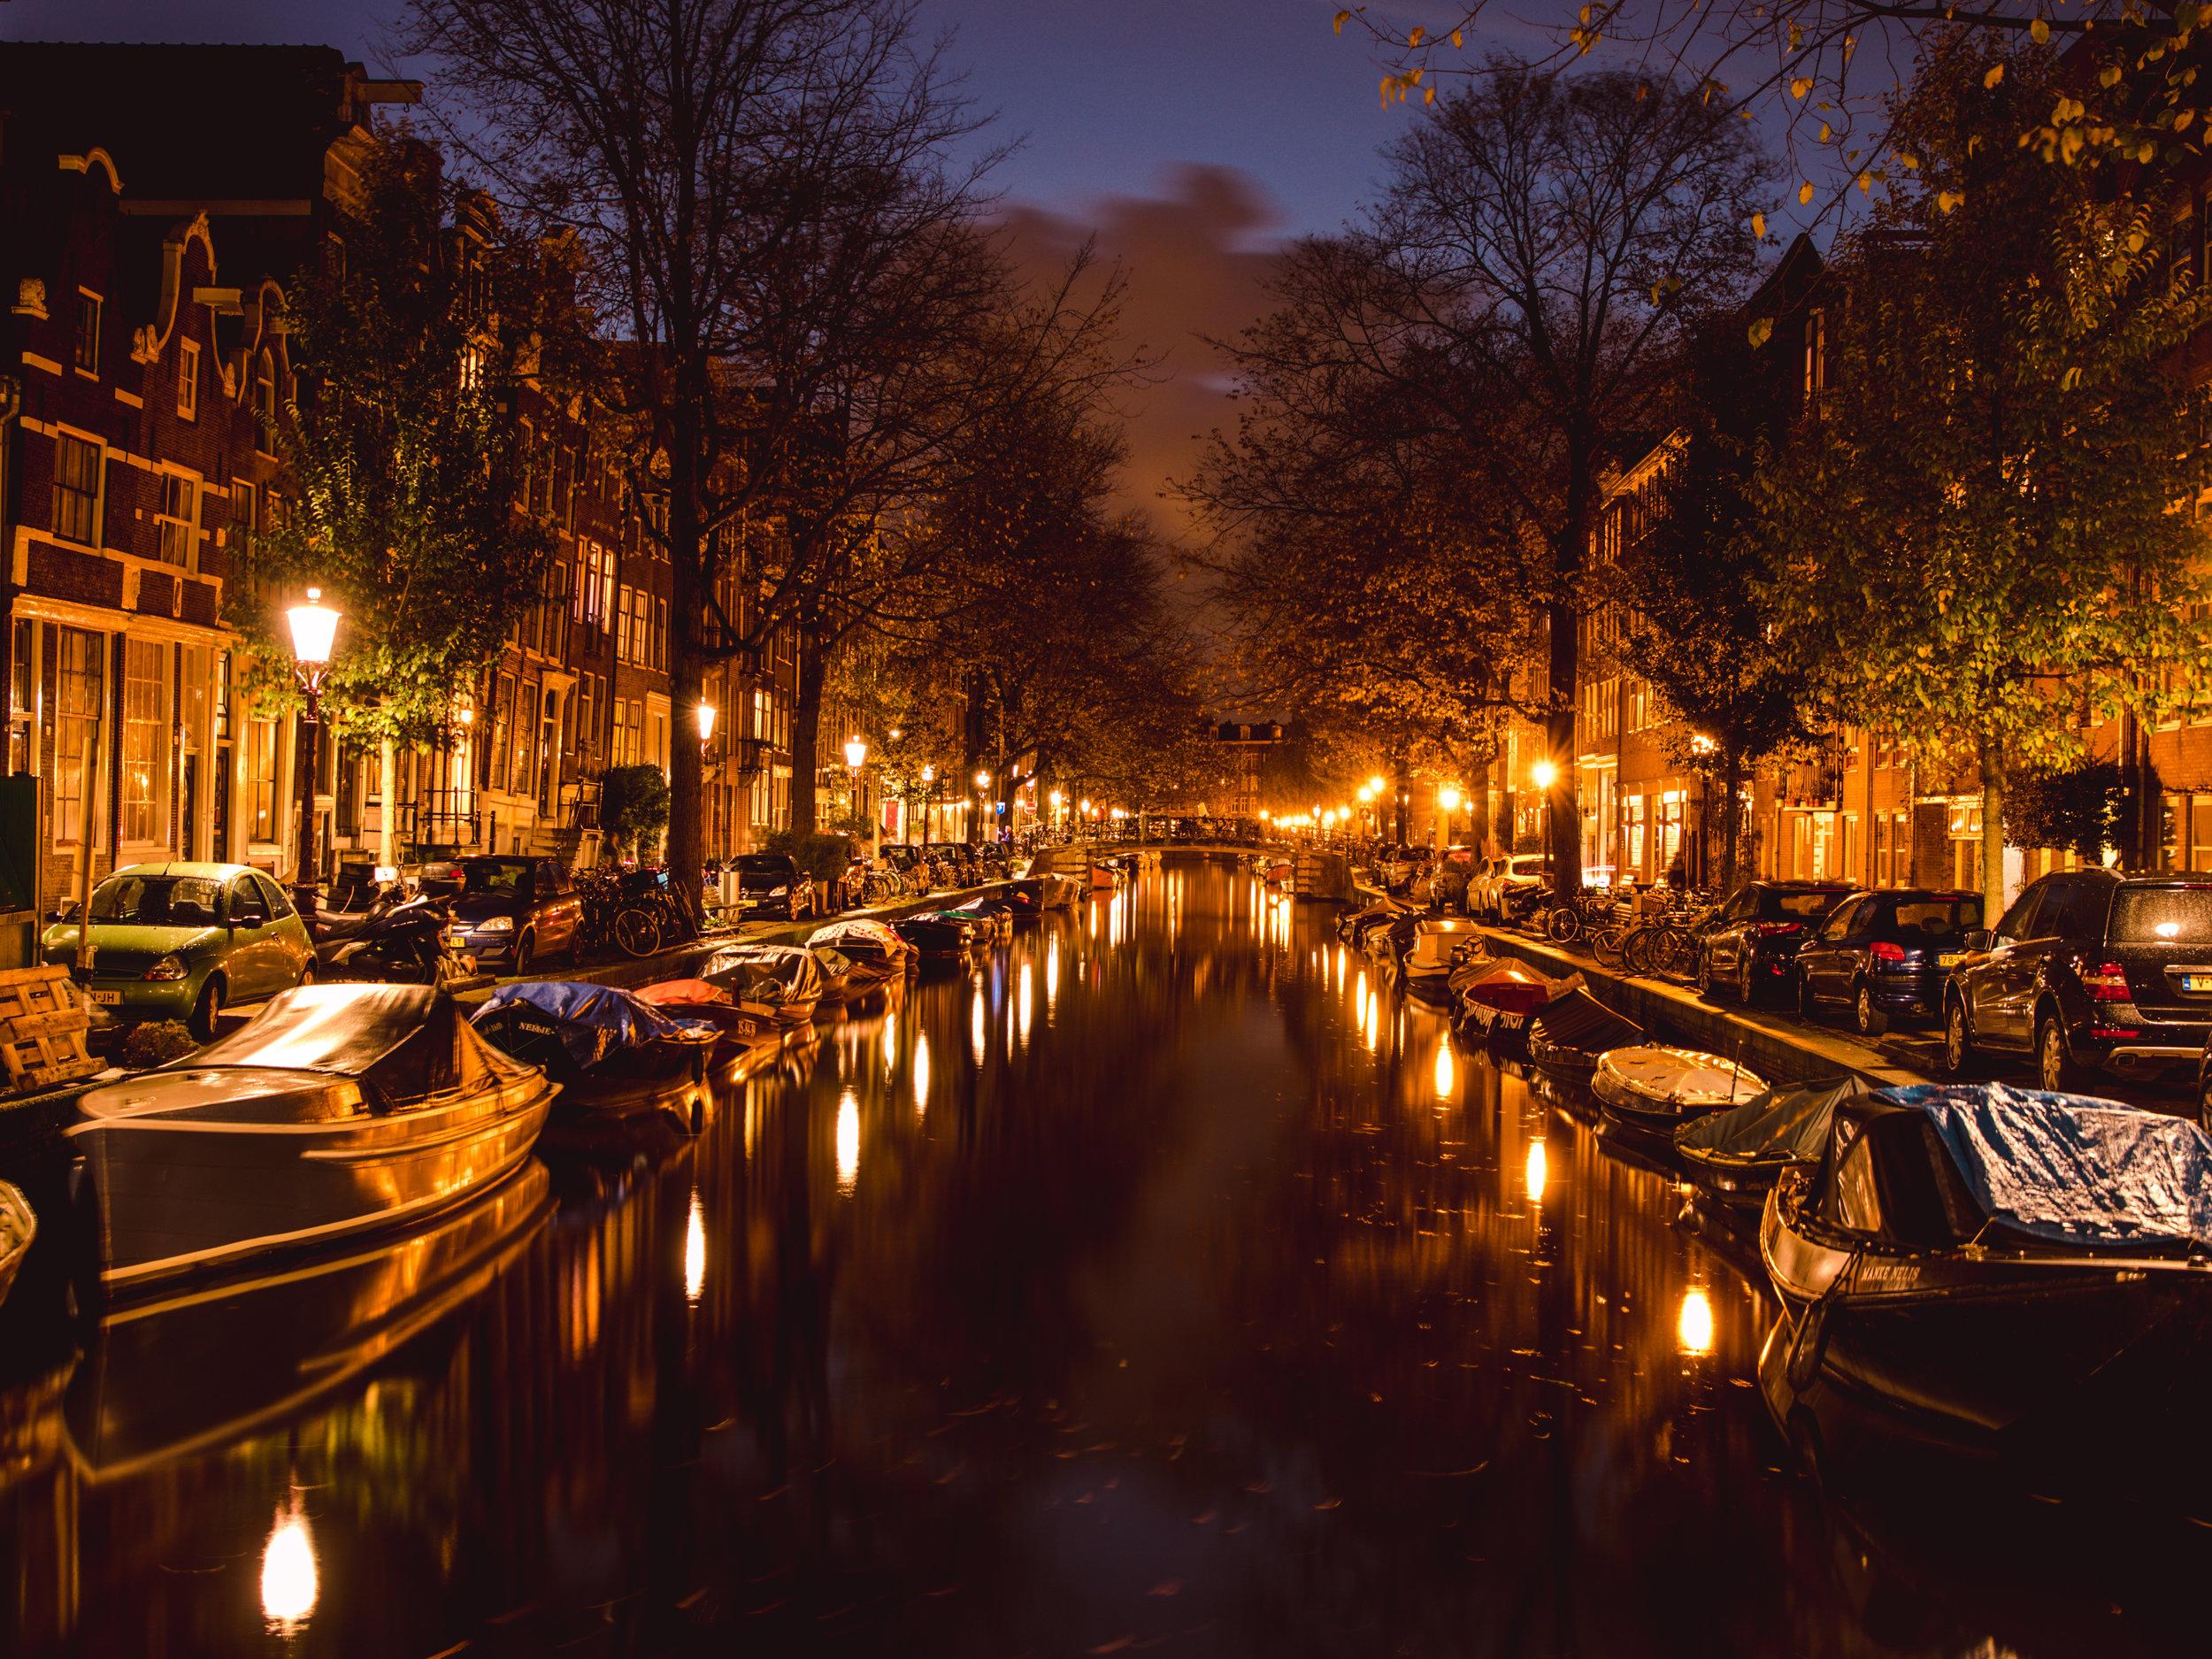 LilyHeaton_AmsterdamCanalsNight.jpg